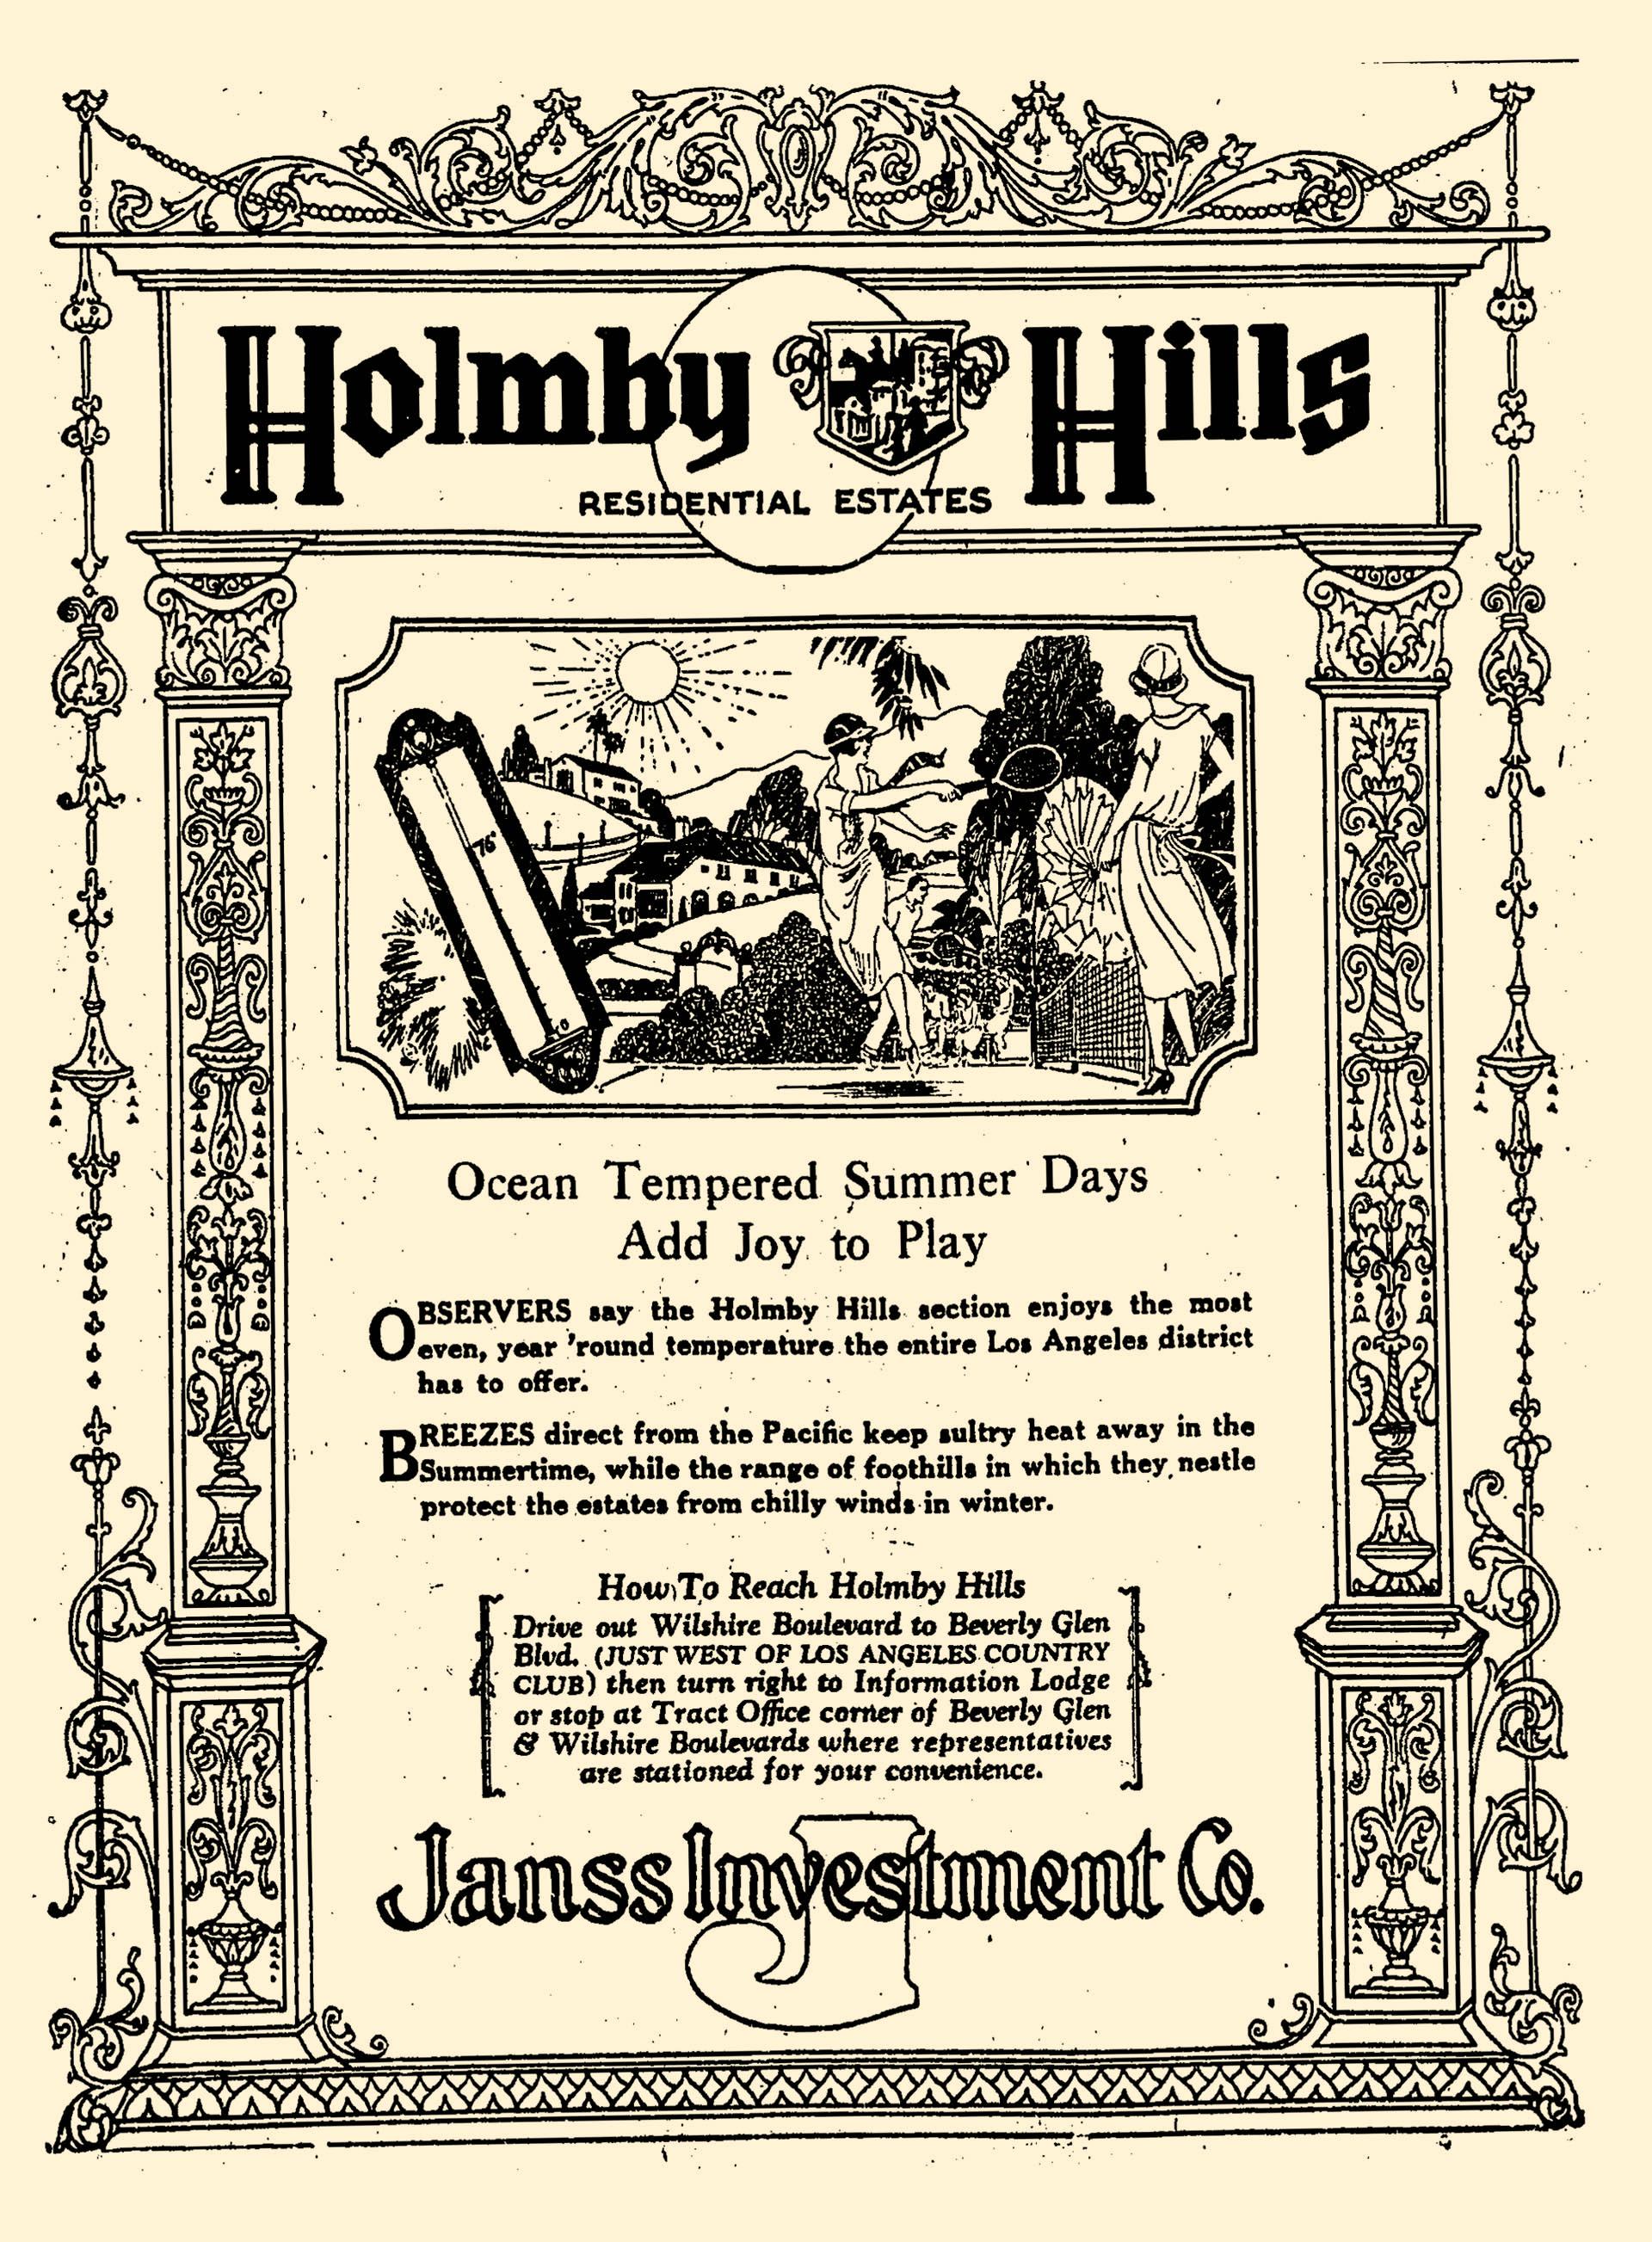 Holmby-Hills-Advt-07-12-1925.jpg